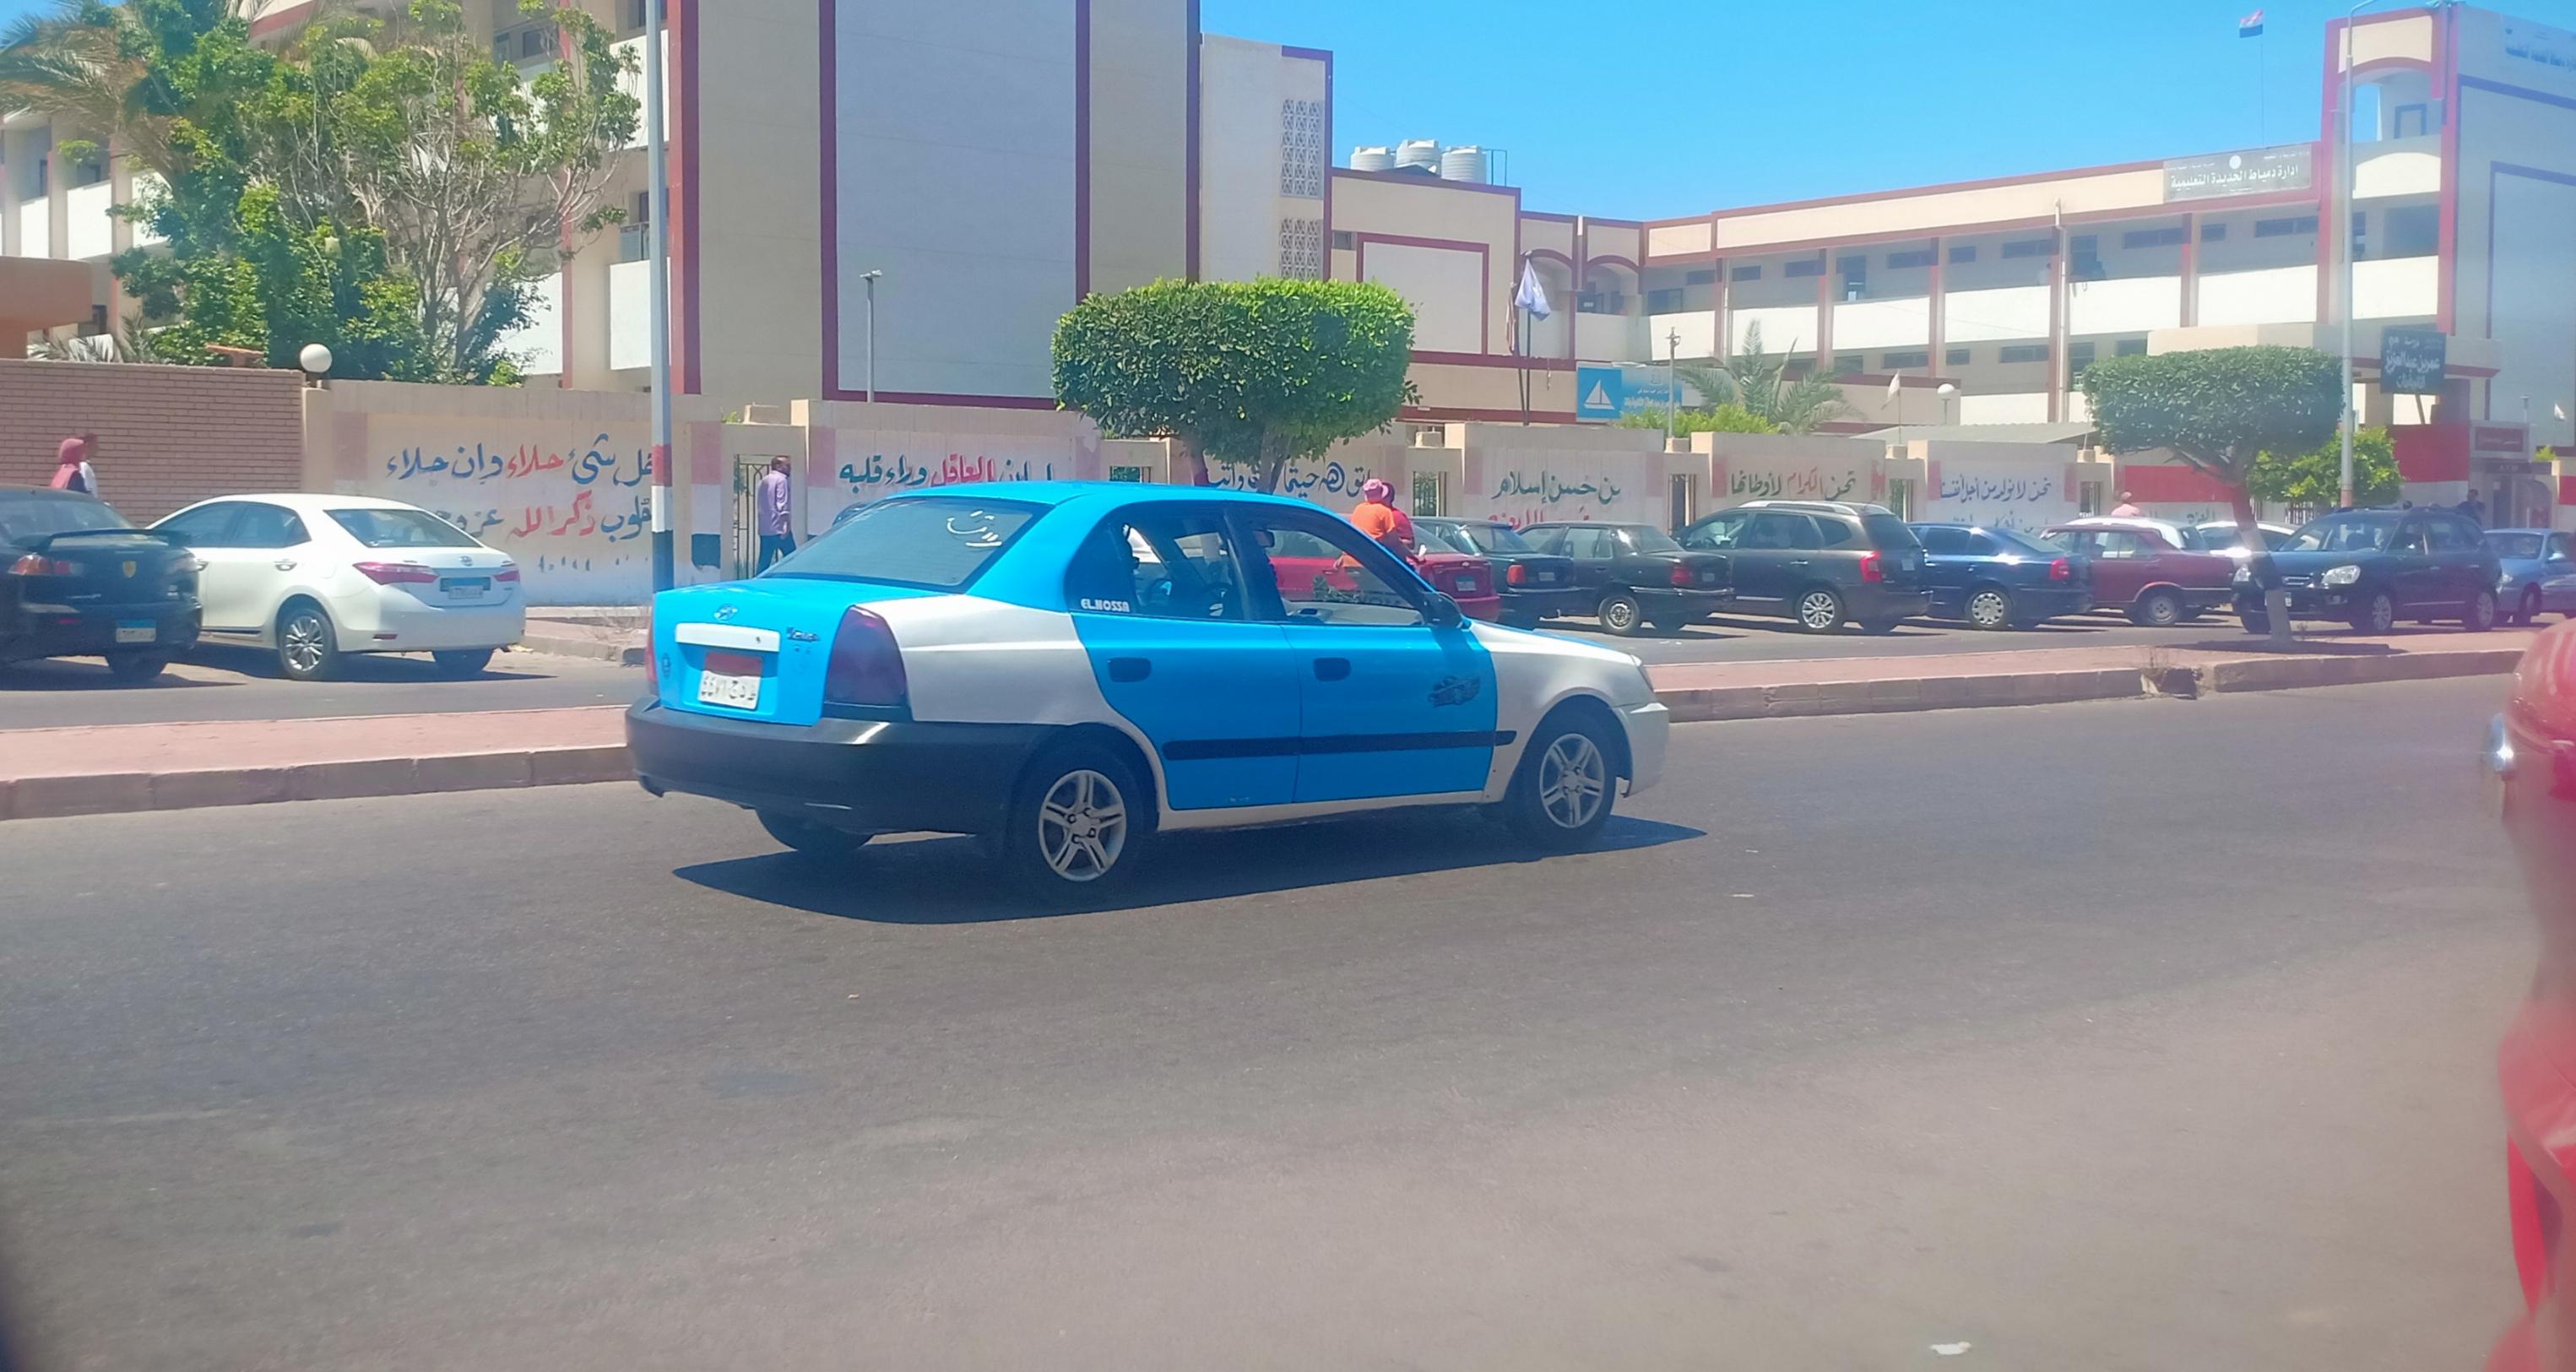 تاكسى (1)